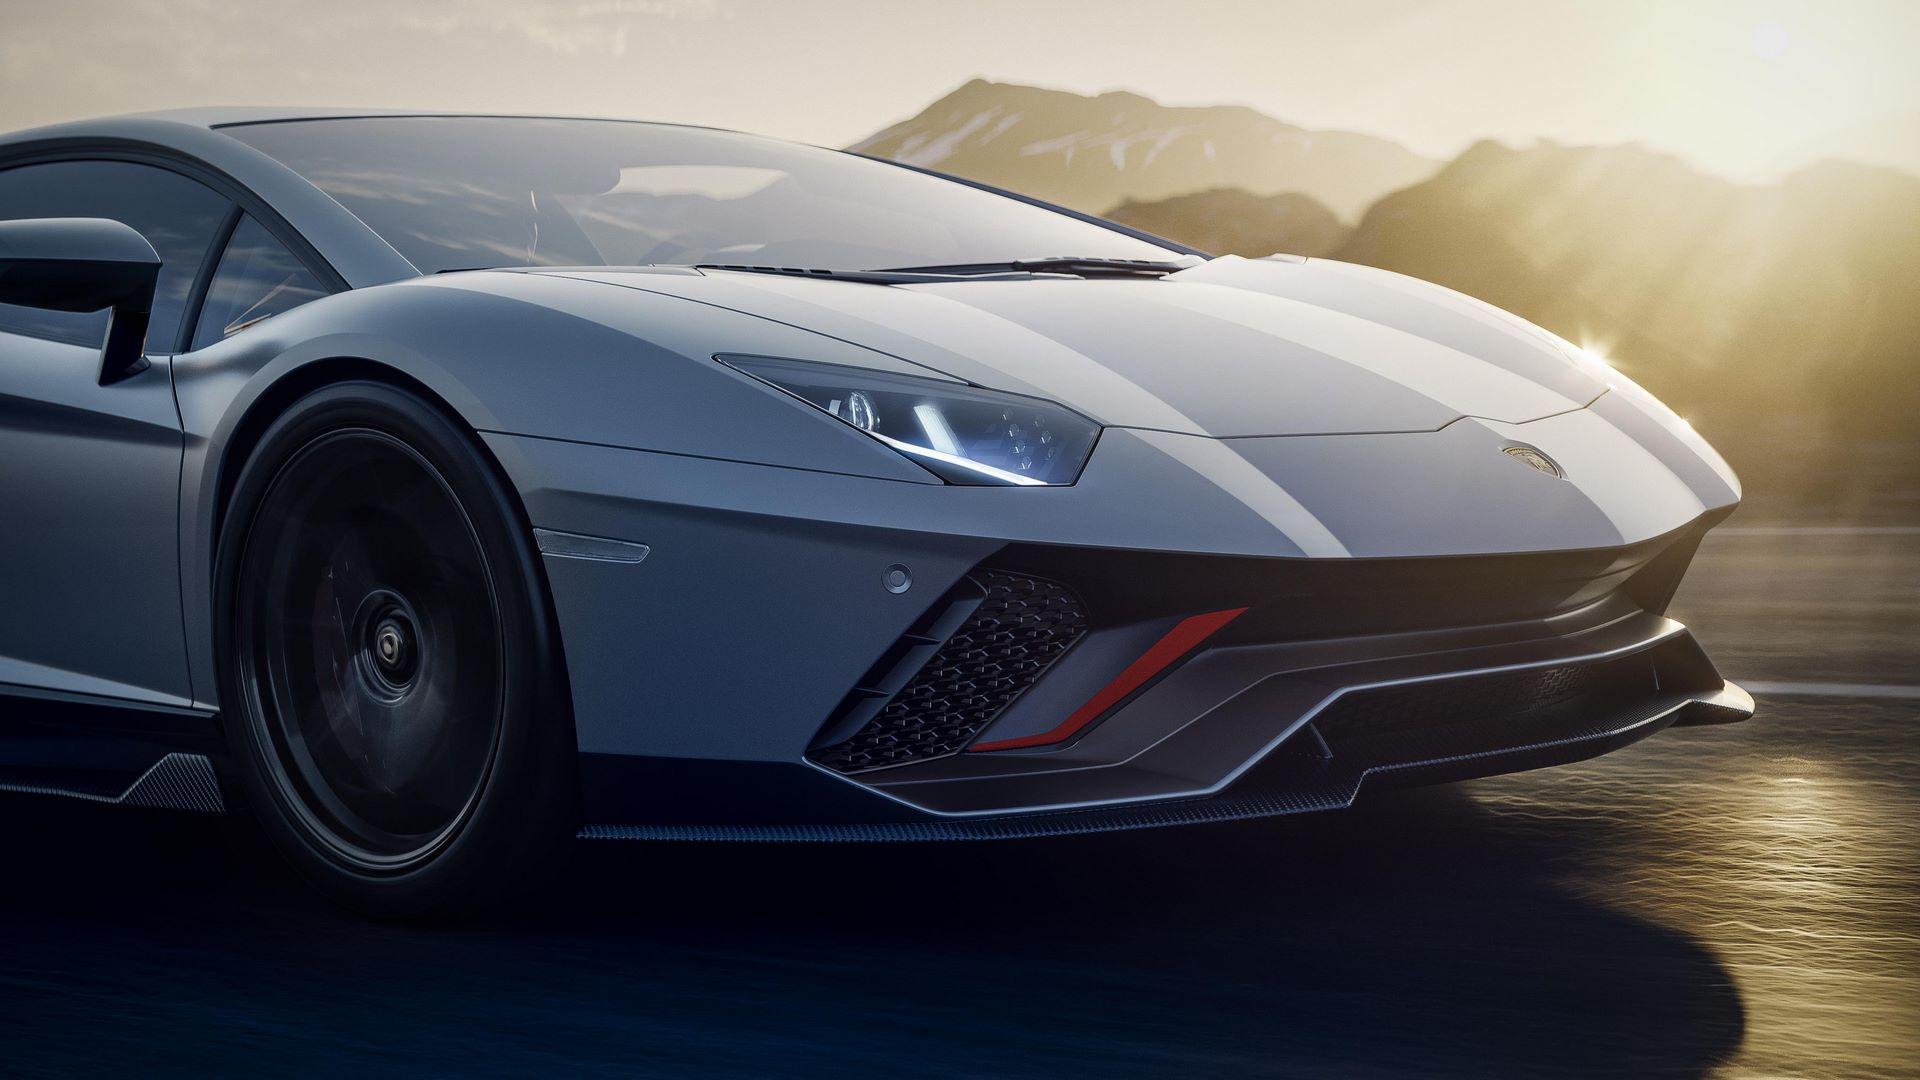 Lamborghini-Aventador-LP780-4-Ultimae-46